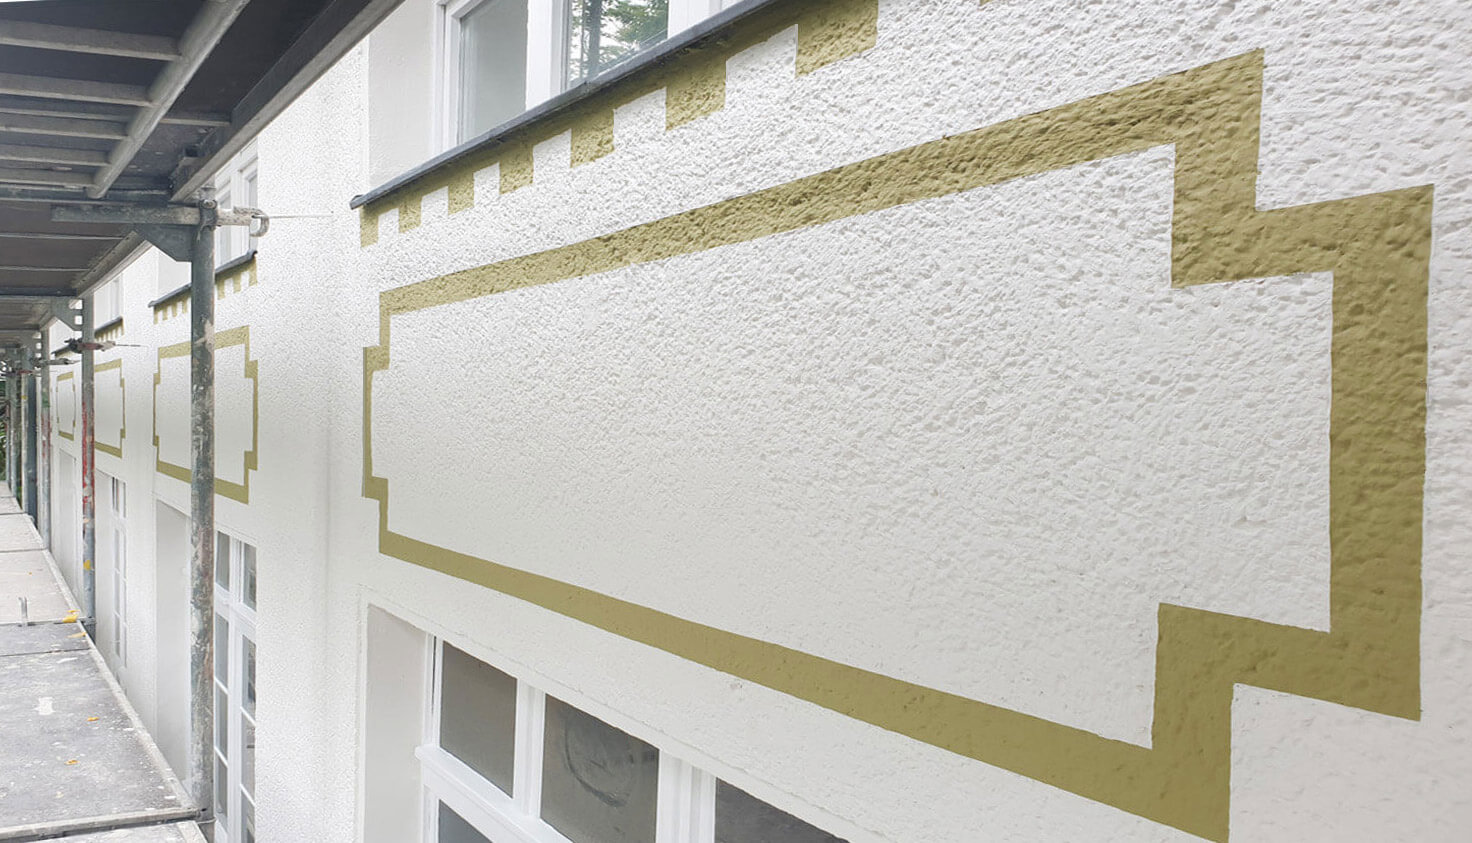 04-Fassade-referenz-malerbetrieb-kluge-berlin